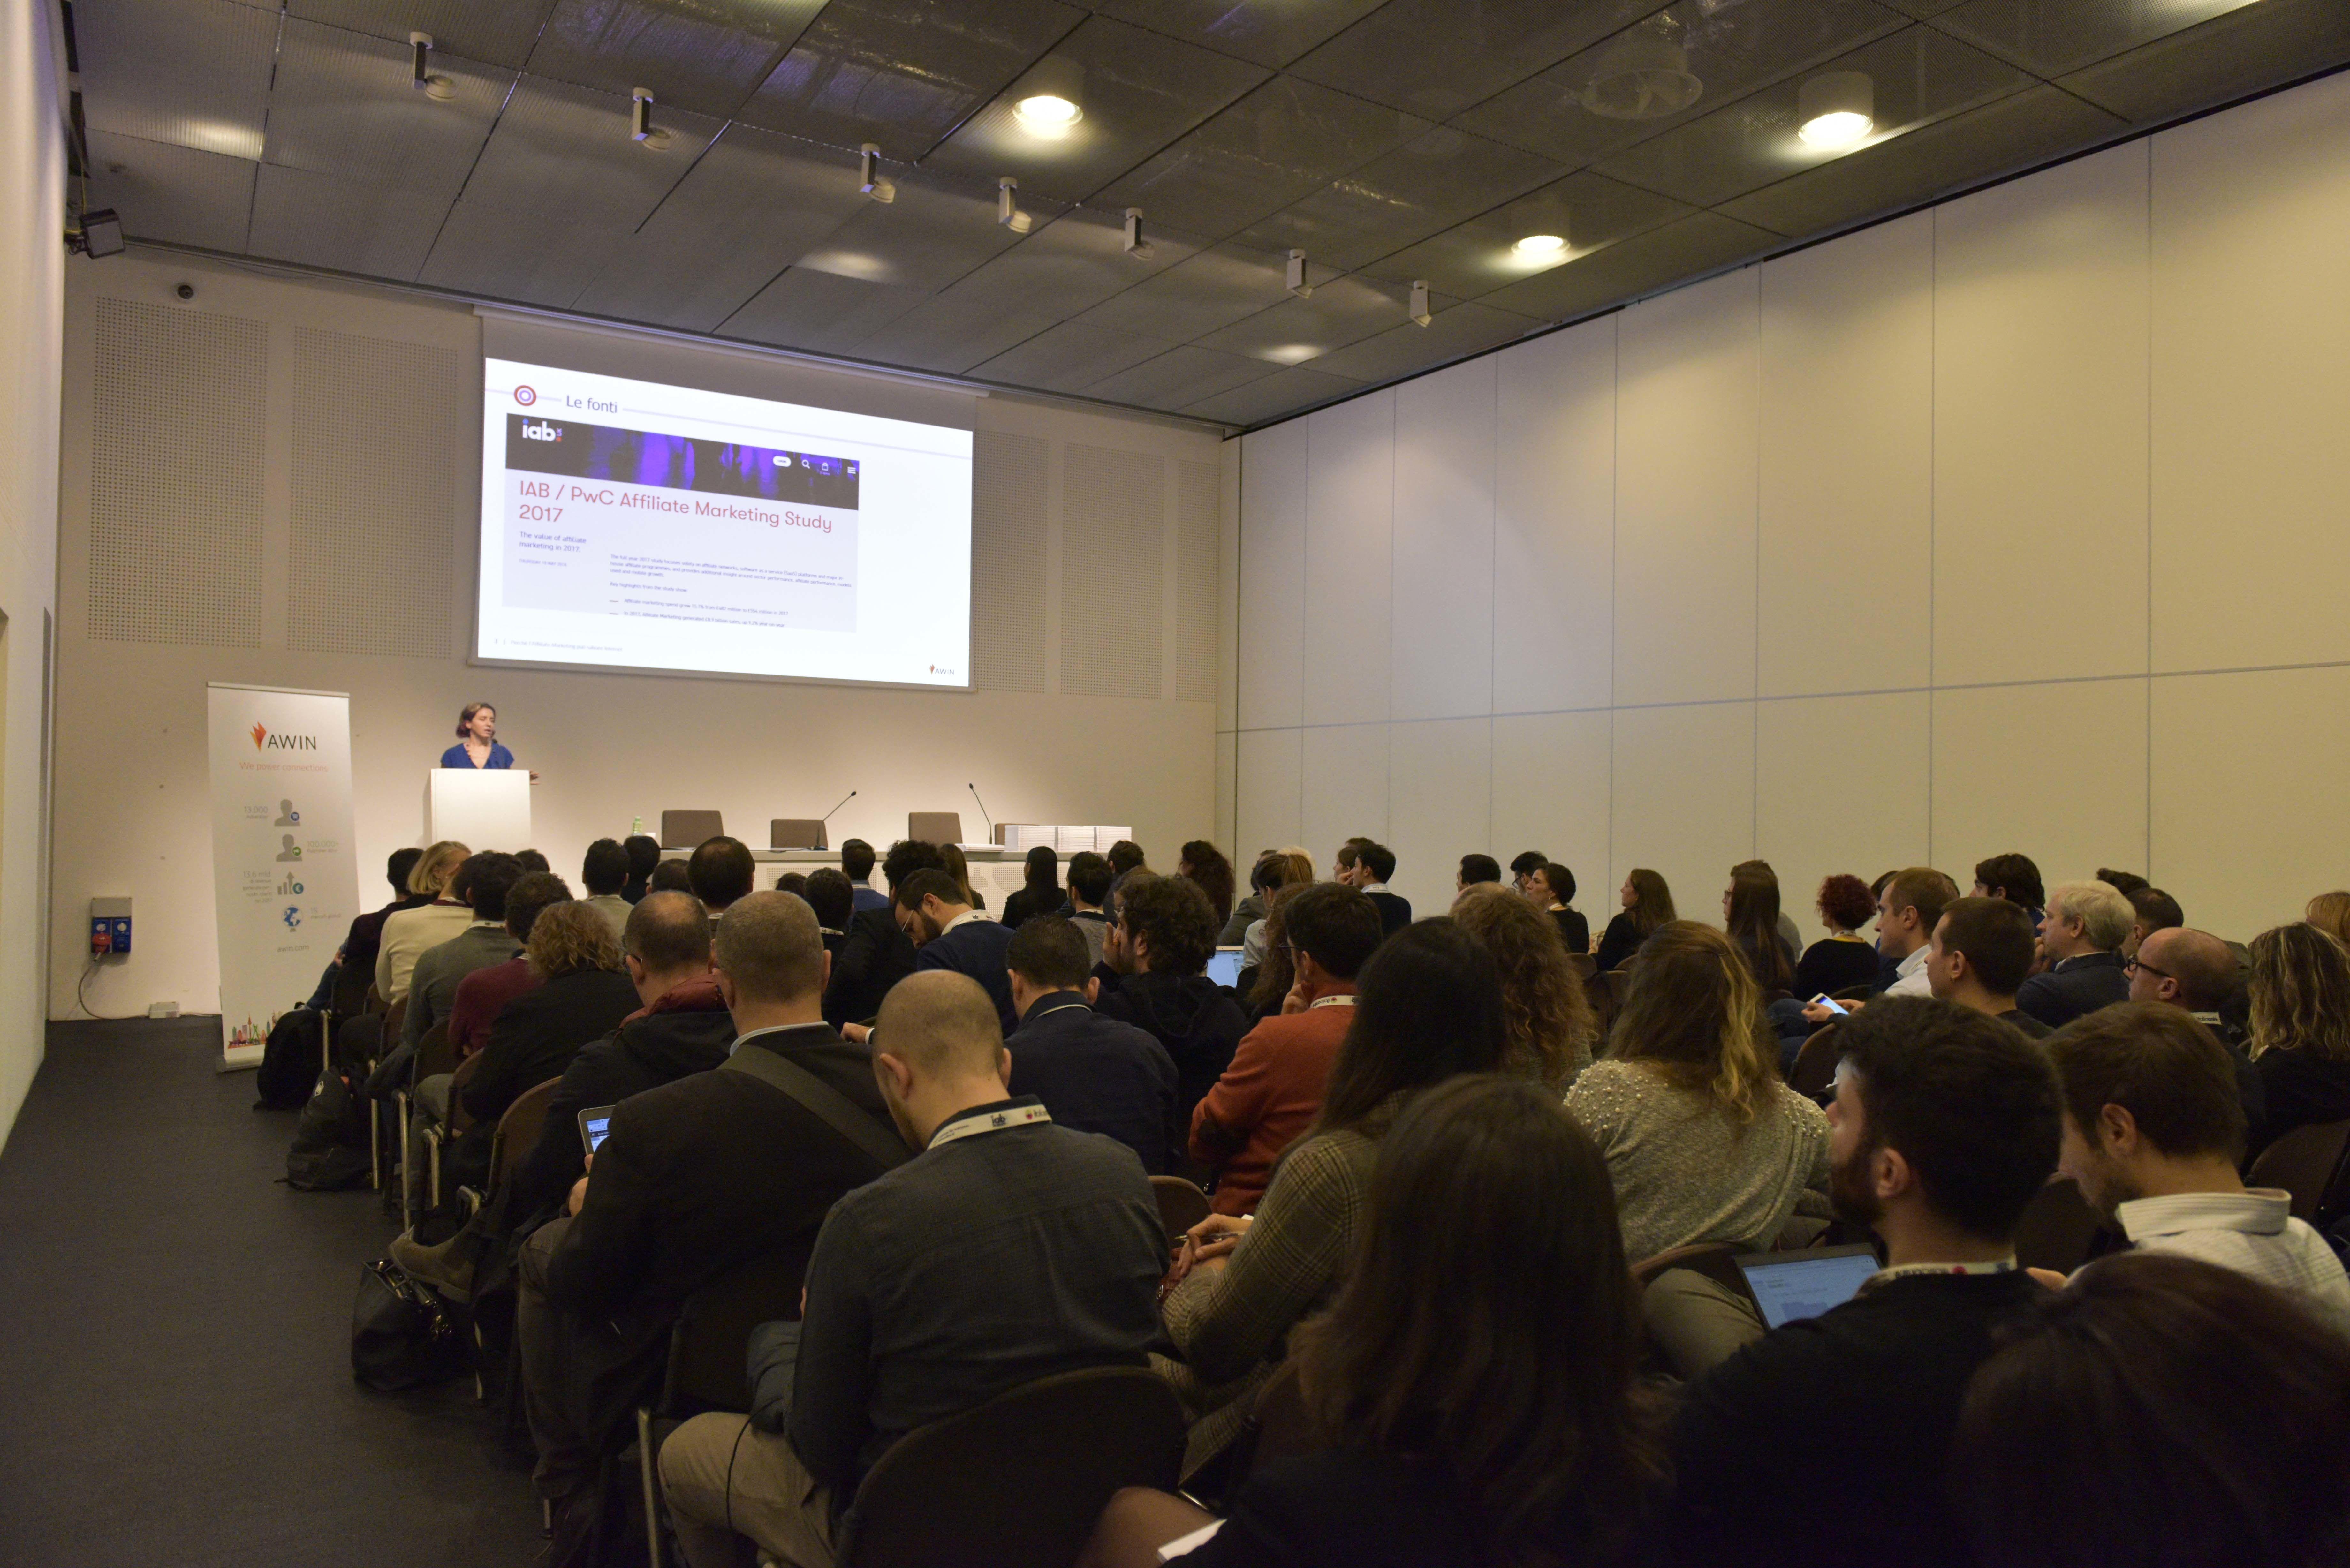 Sala conferenze piena di partecipanti